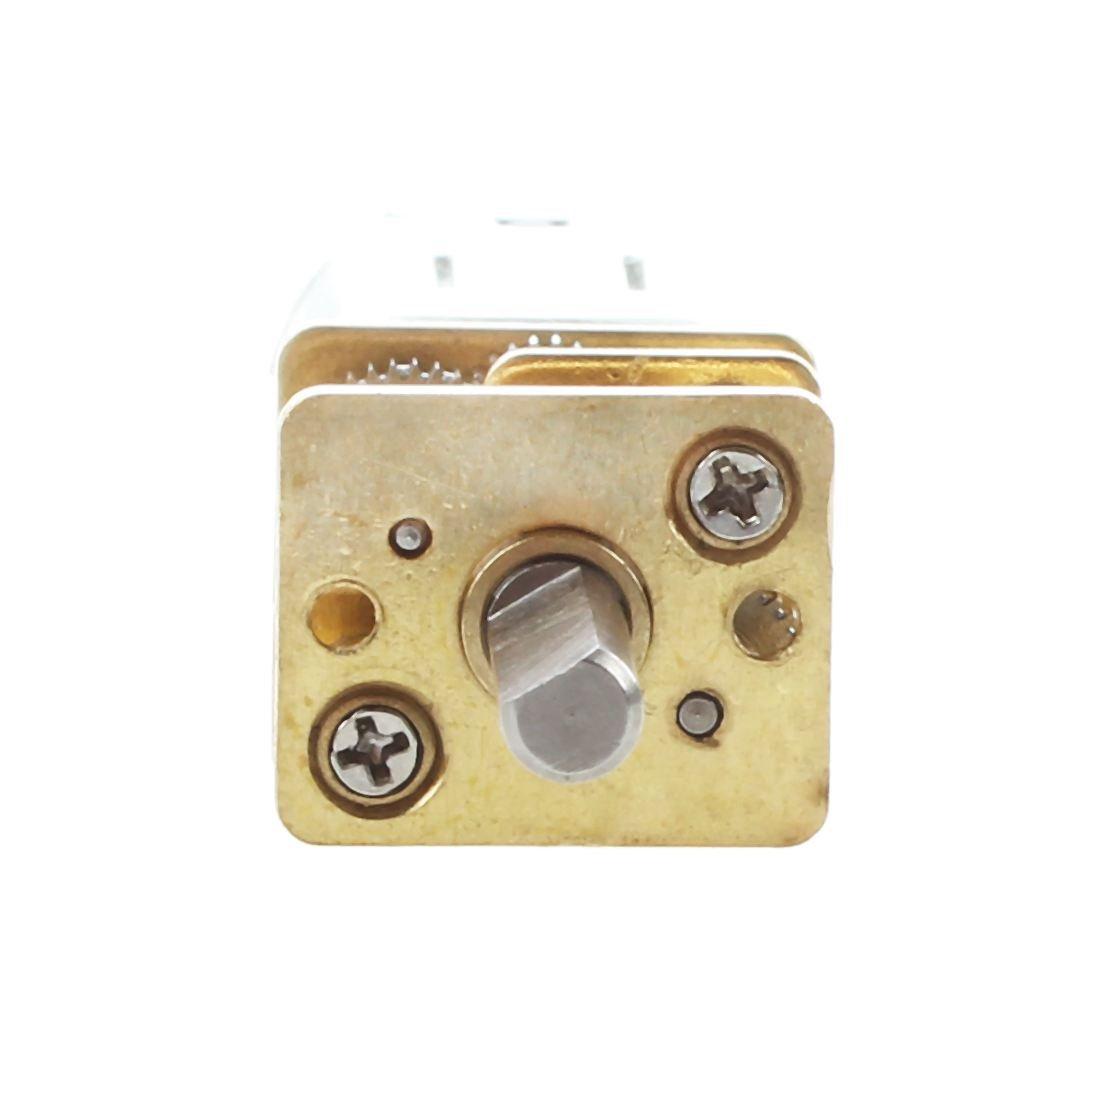 REFURBISHHOUSE DIY robot 60 RPM 6V 0.3A High momento torcente Mini CC elettrico motoriduttore